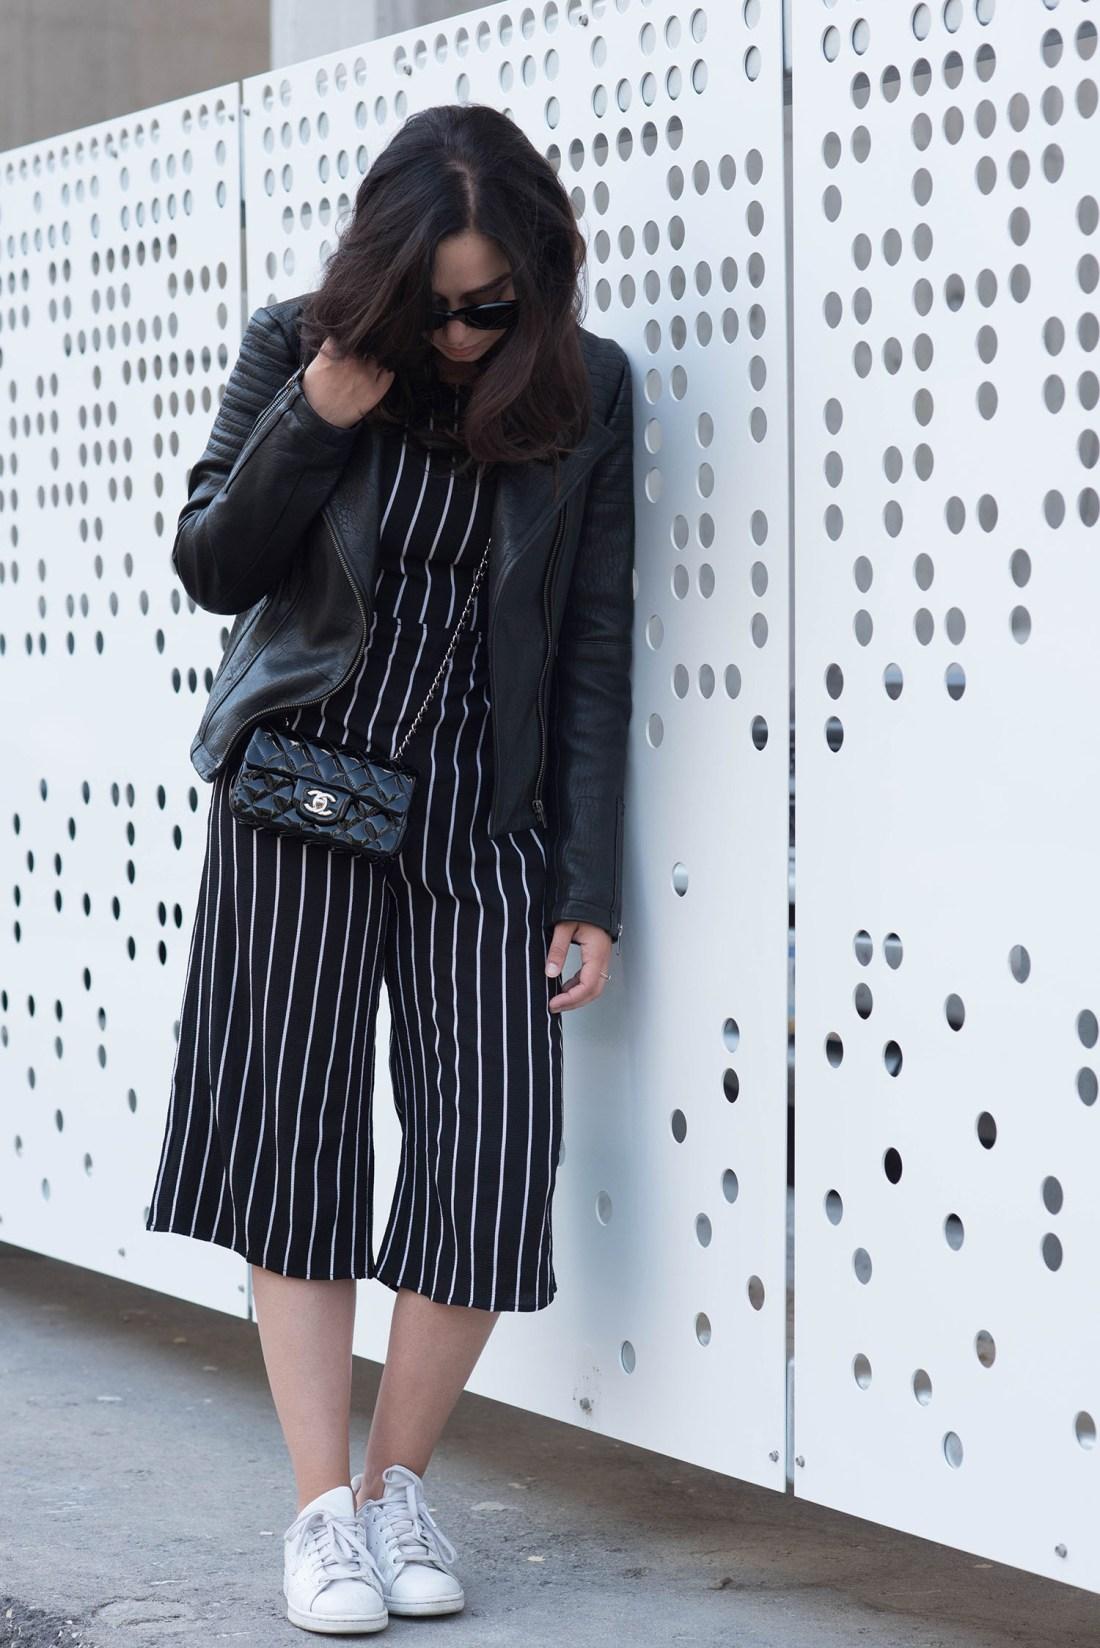 Winnipeg fashion blogger Cee Fardoe of Coco & Vera wears a black striped Missy Empire jumpsuit, white Adidas Stan Smith sneakers and Celine Audrey sunglasses